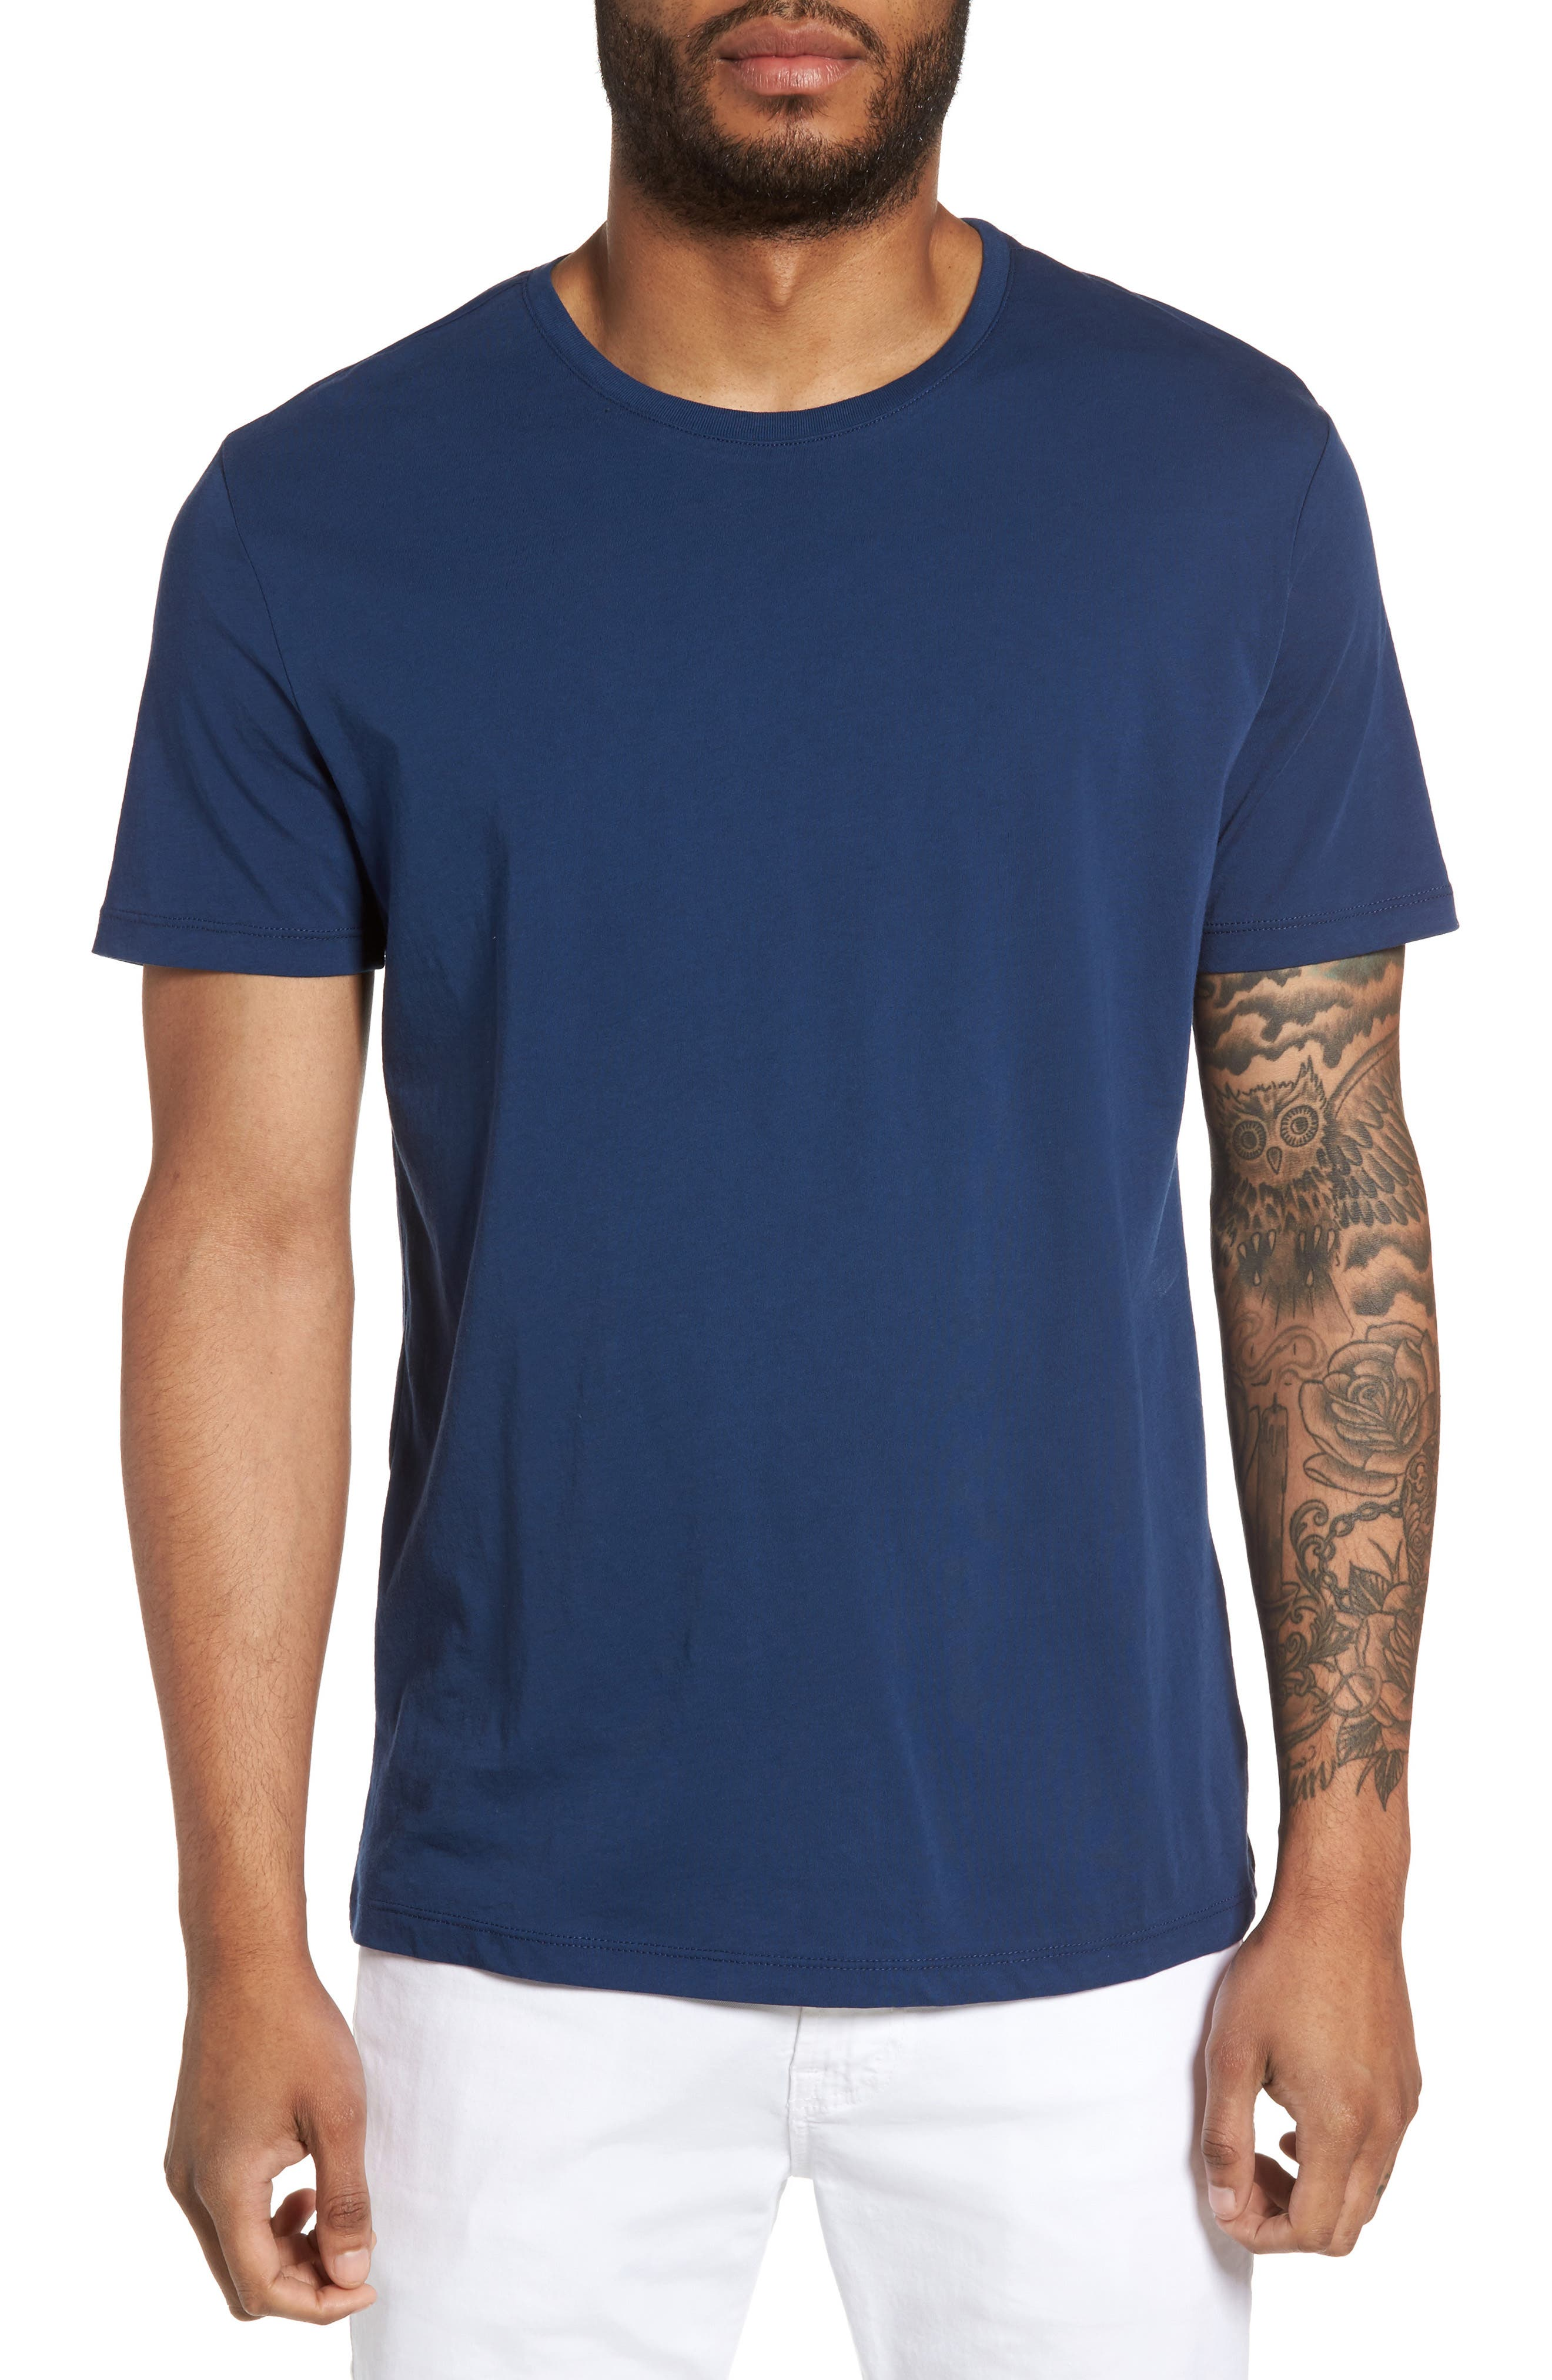 Main Image - Slate & Stone Slim Crewneck T-Shirt